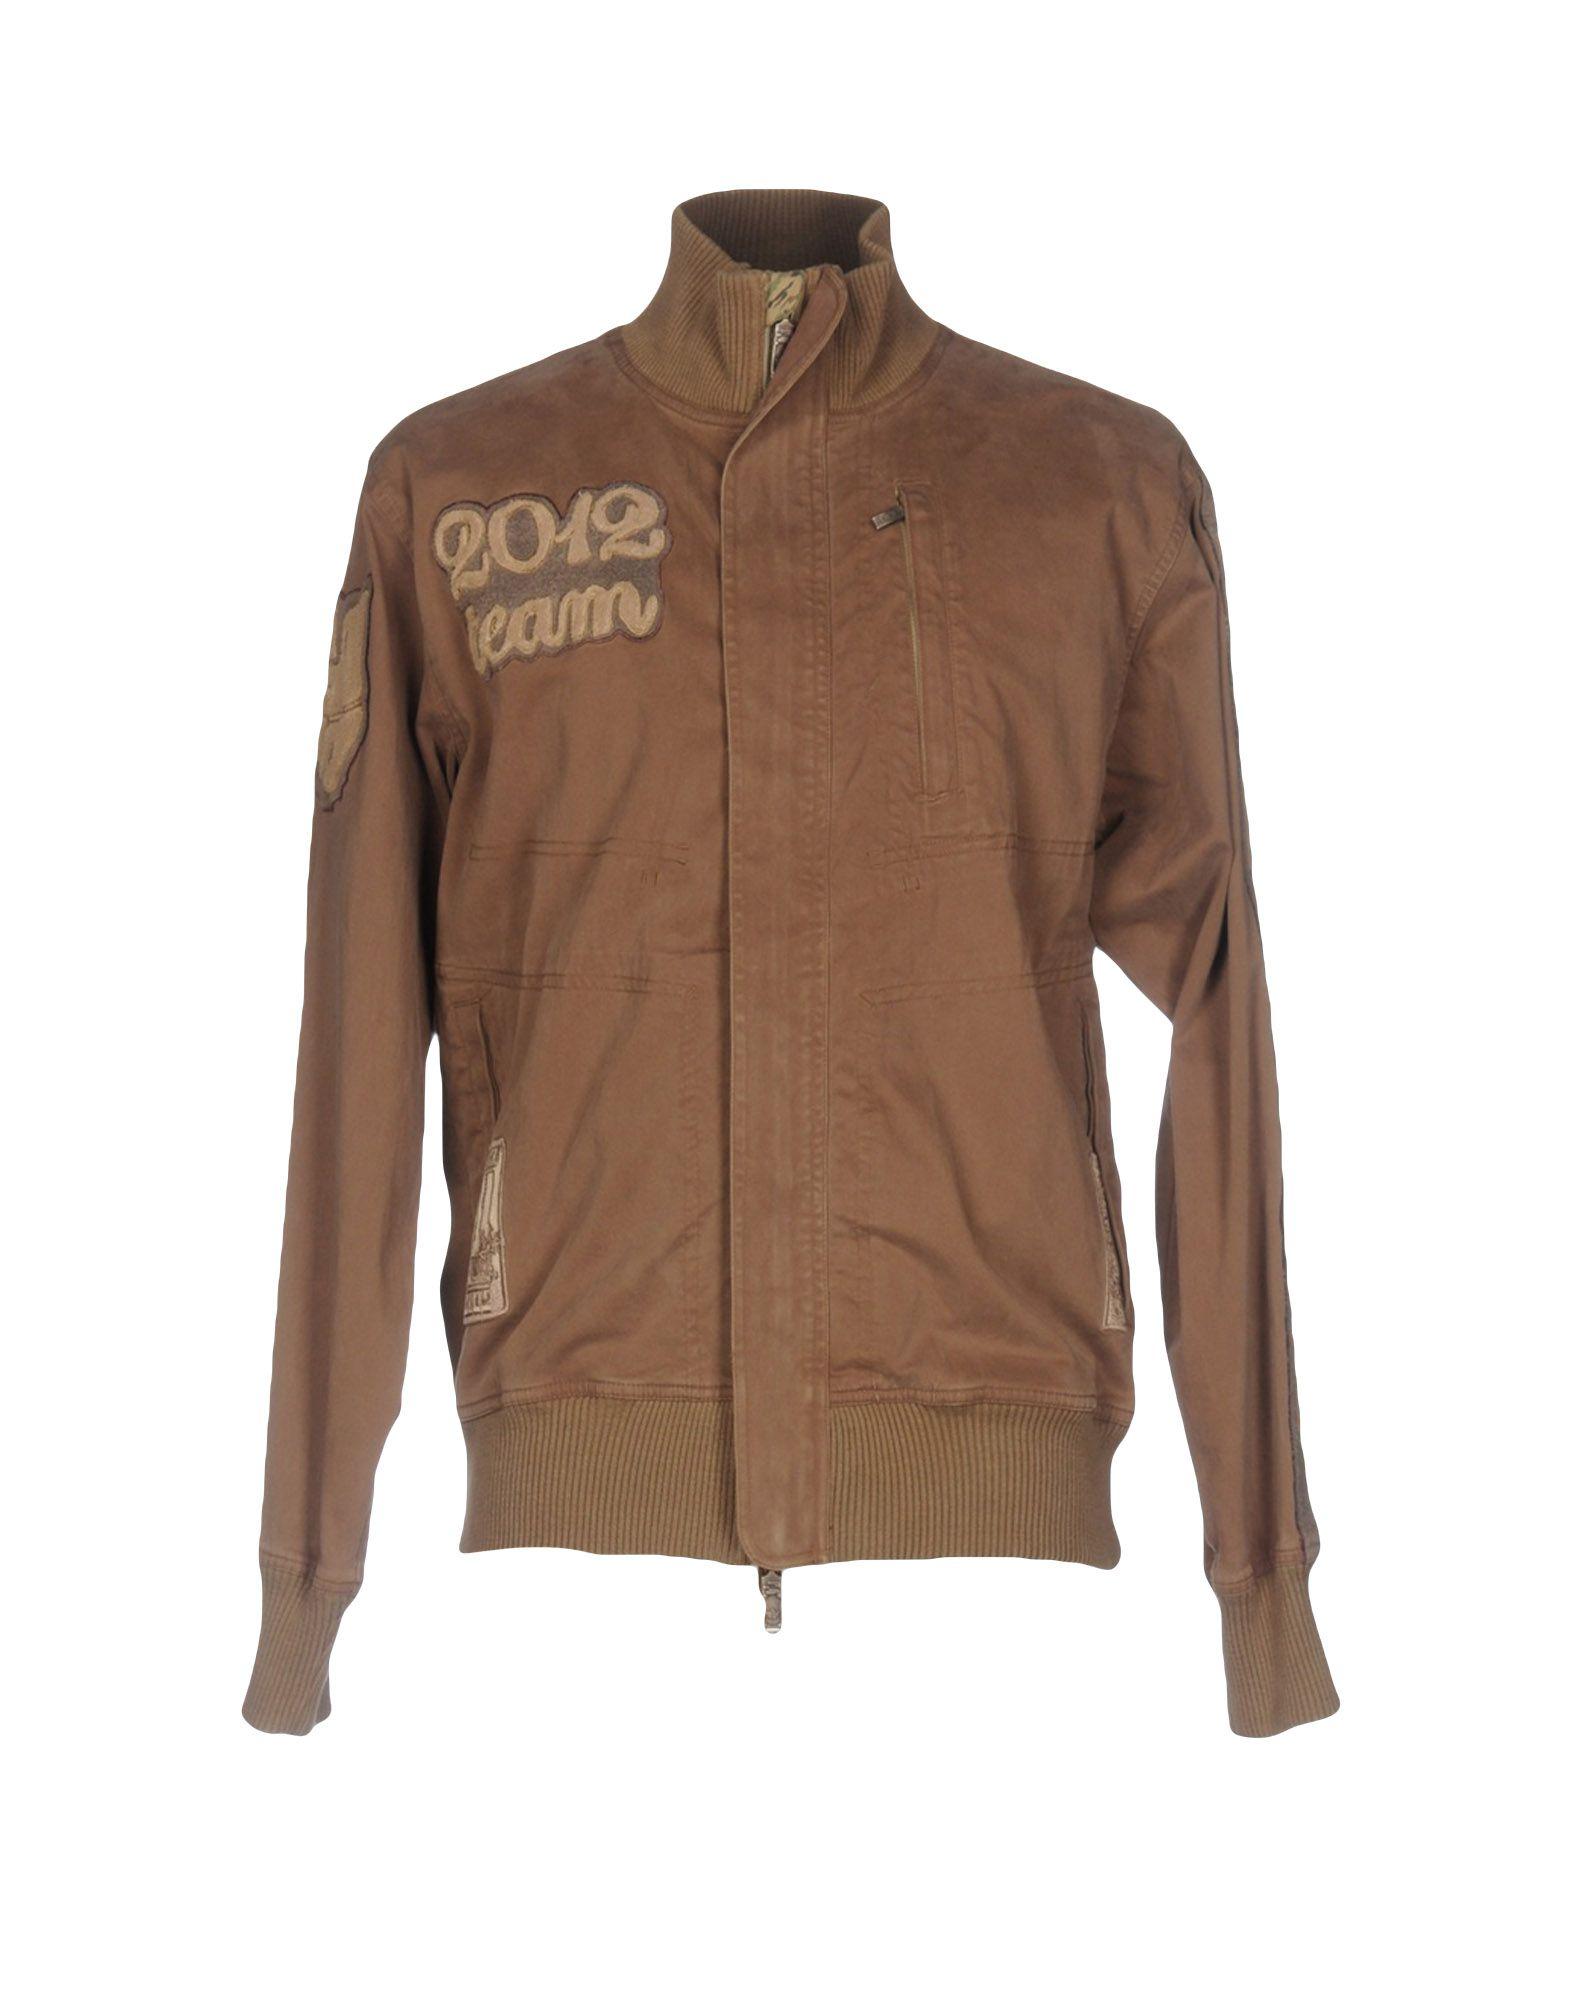 MAHARISHI Herren Jacke Farbe Khaki Größe 5